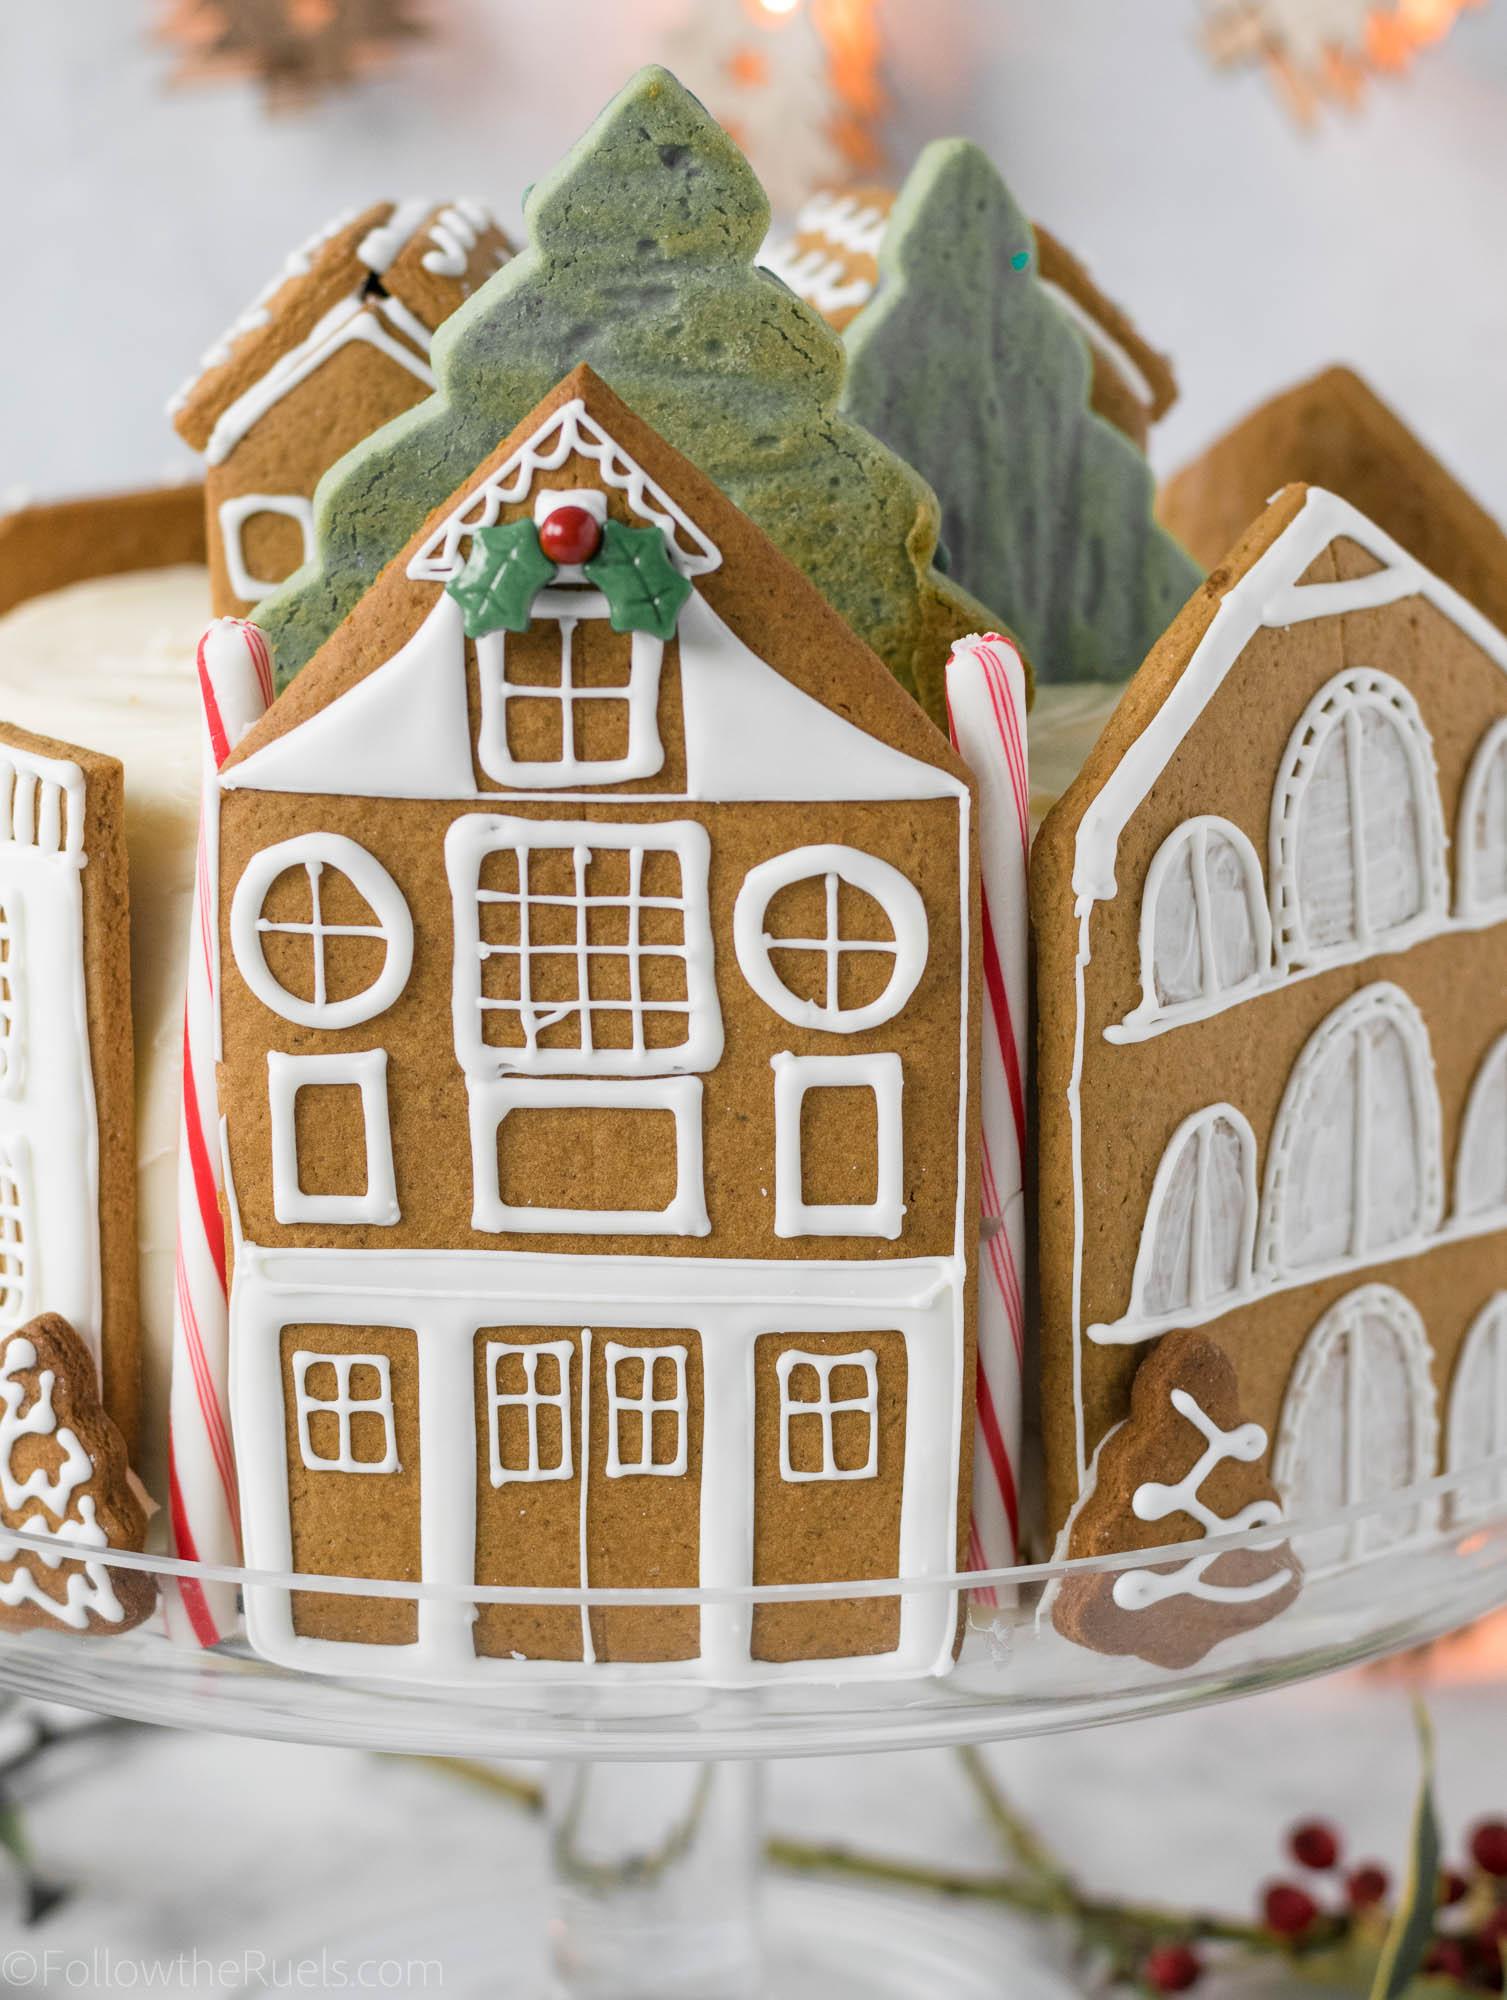 Gingerbread-Village-Cake-17.jpg